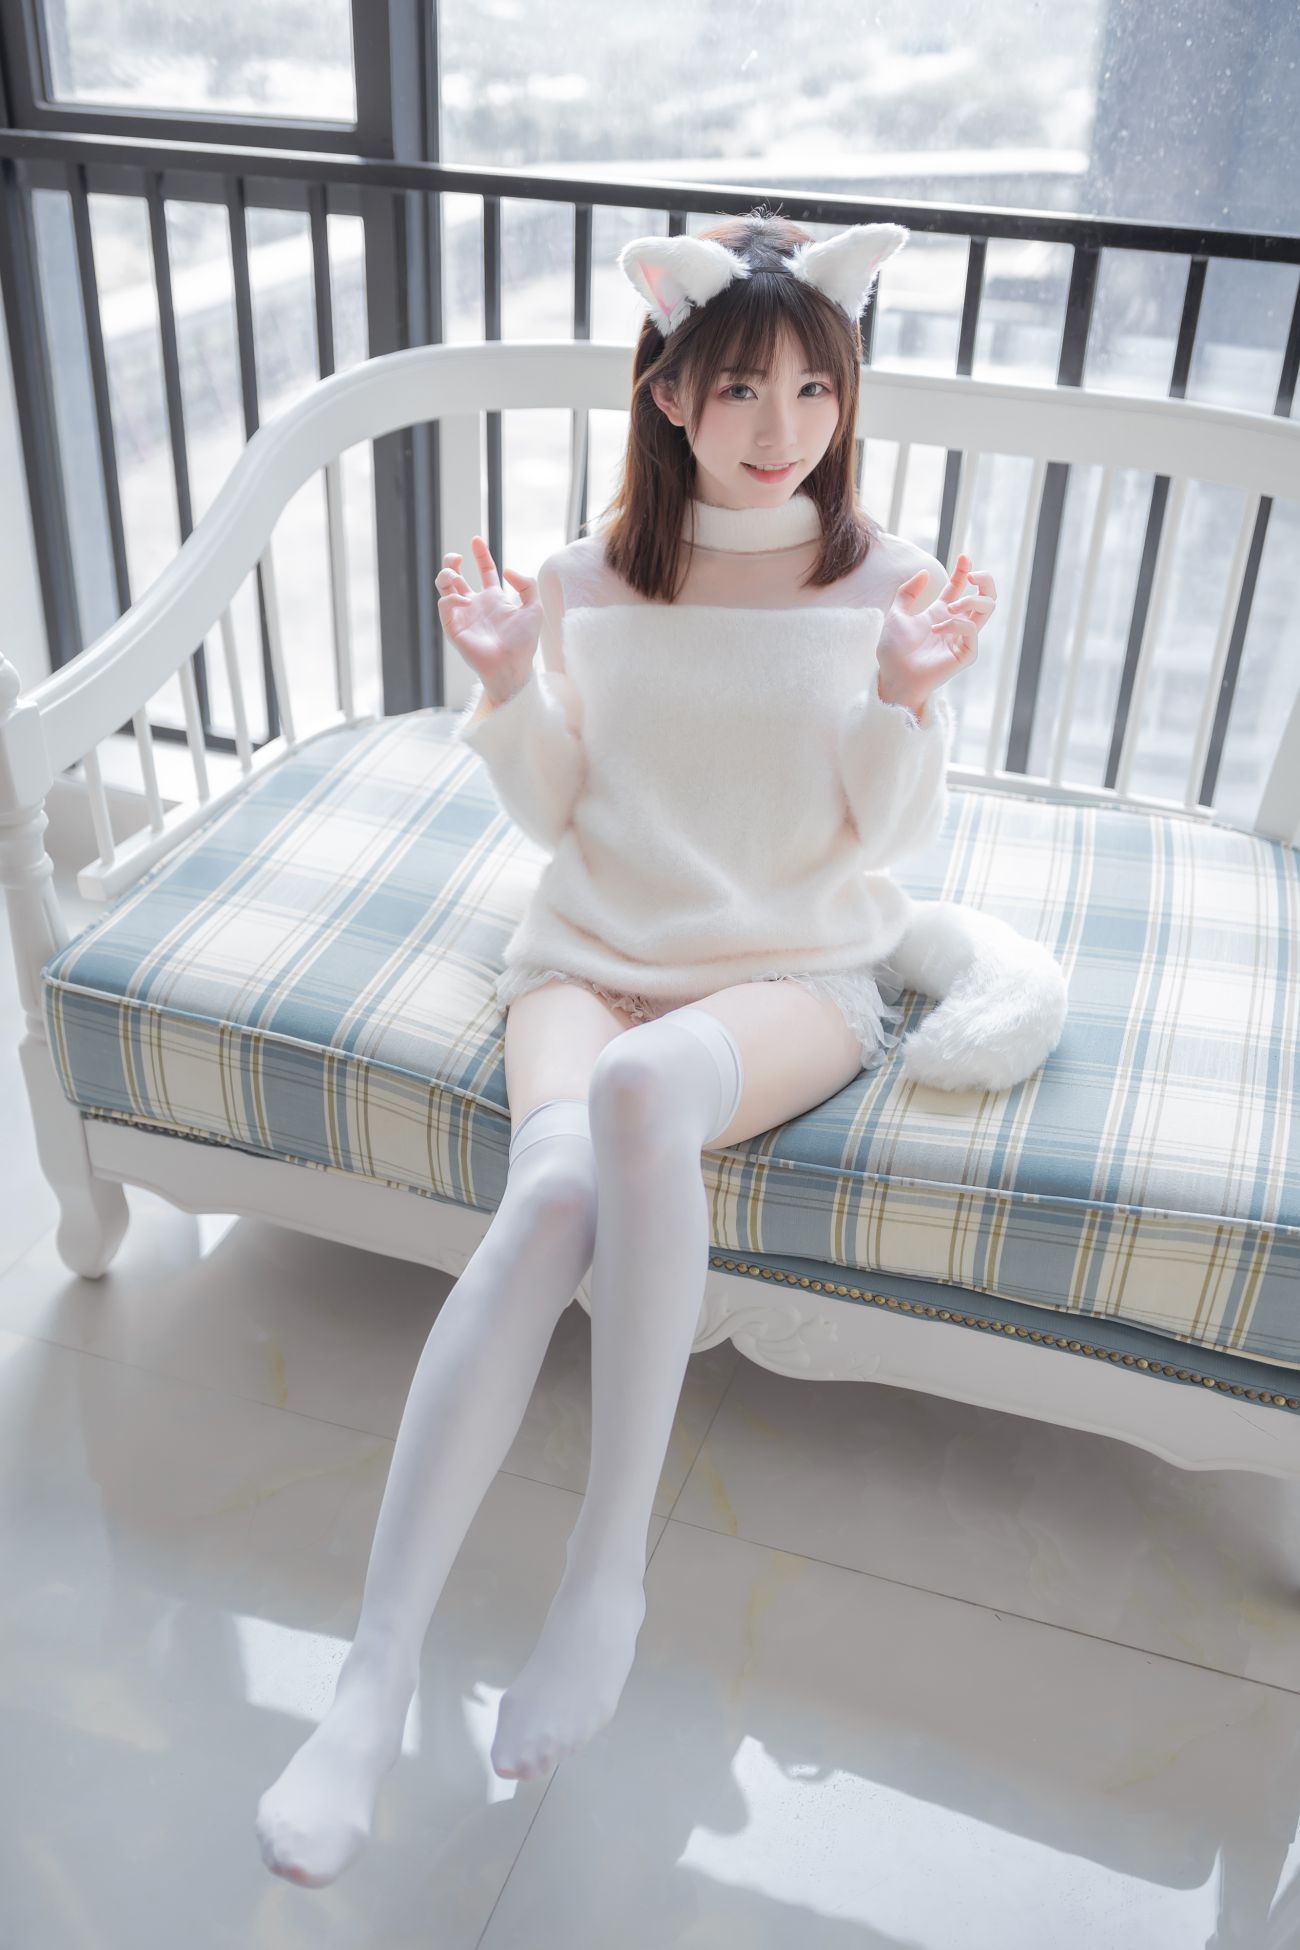 Kitaro绮太郎白喵女友